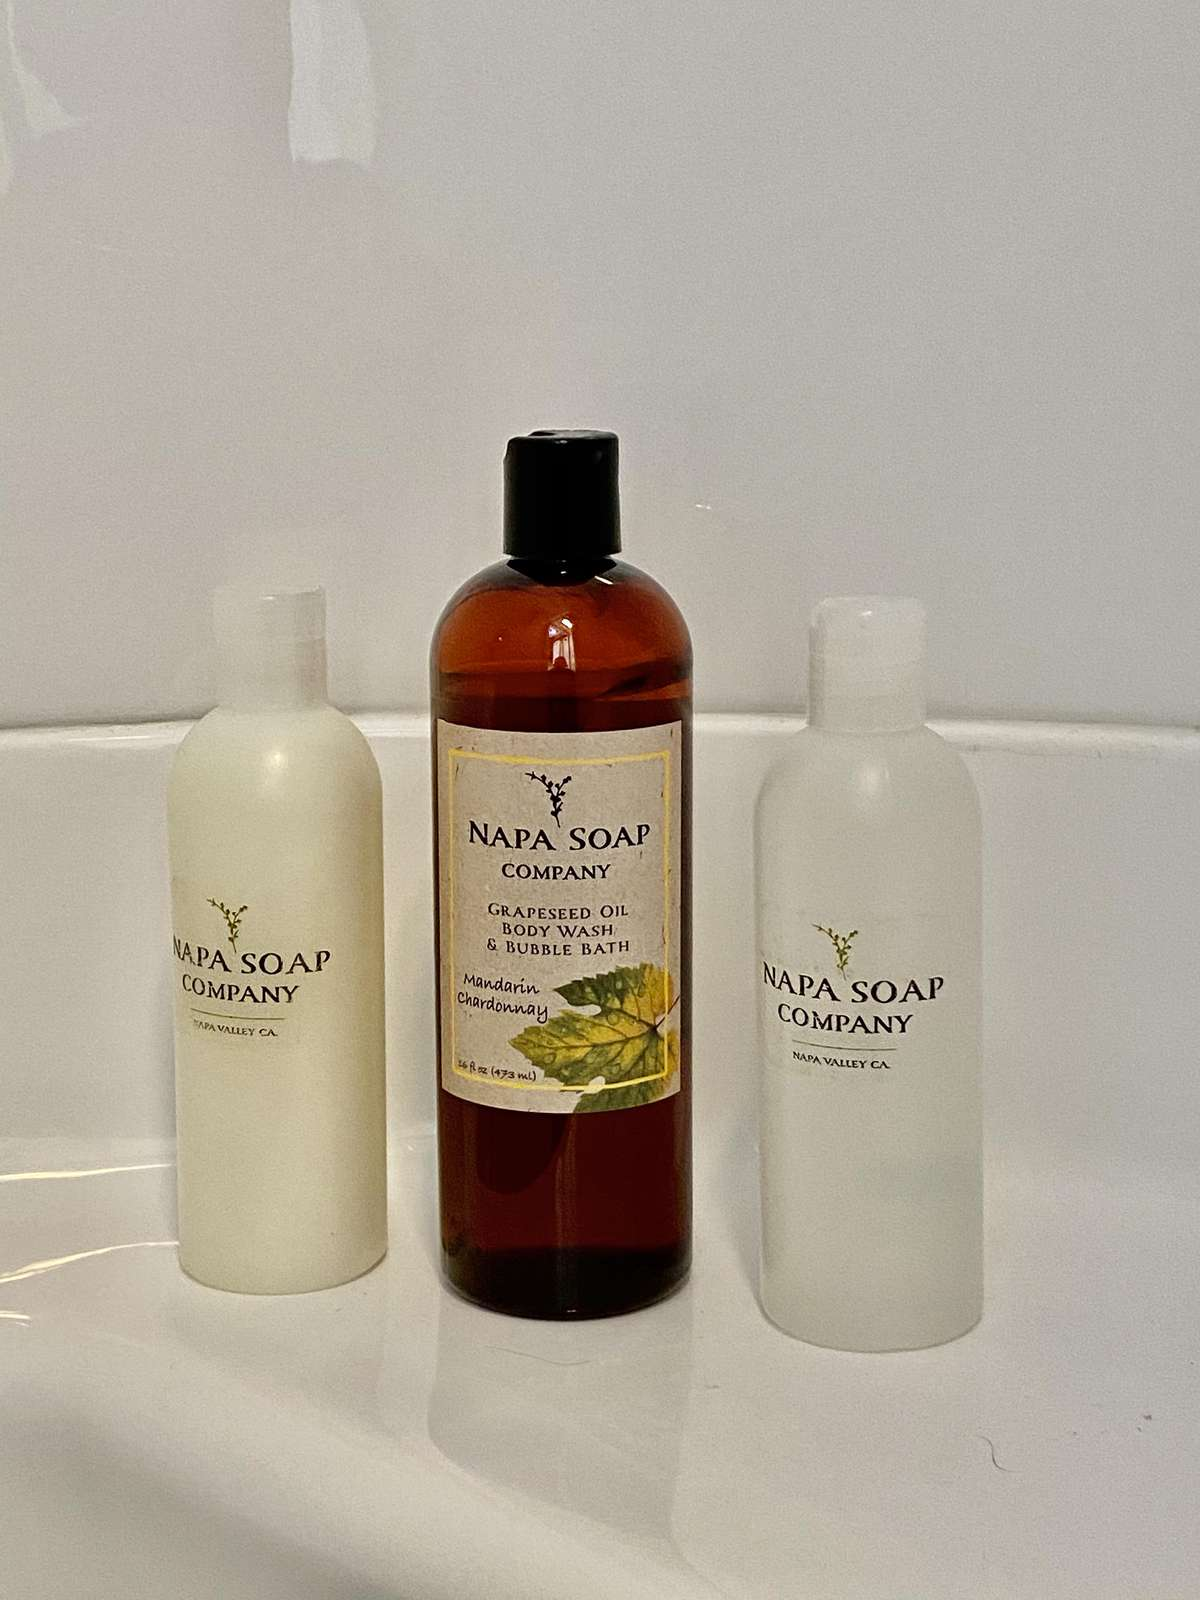 Napa Soap Company Bath Amenties